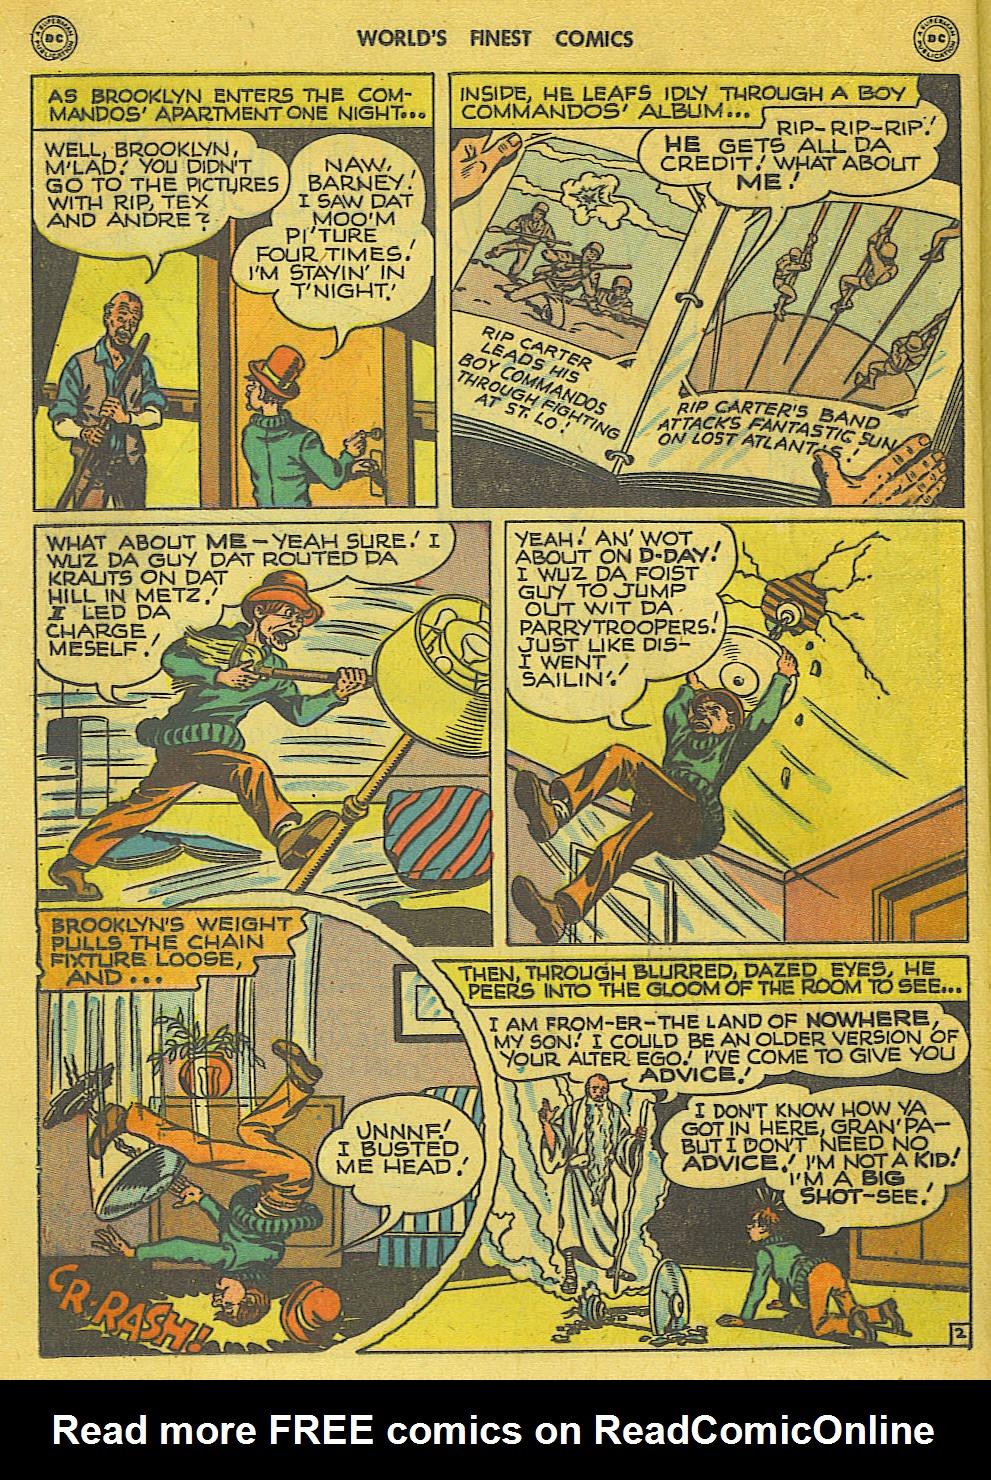 Read online World's Finest Comics comic -  Issue #34 - 28